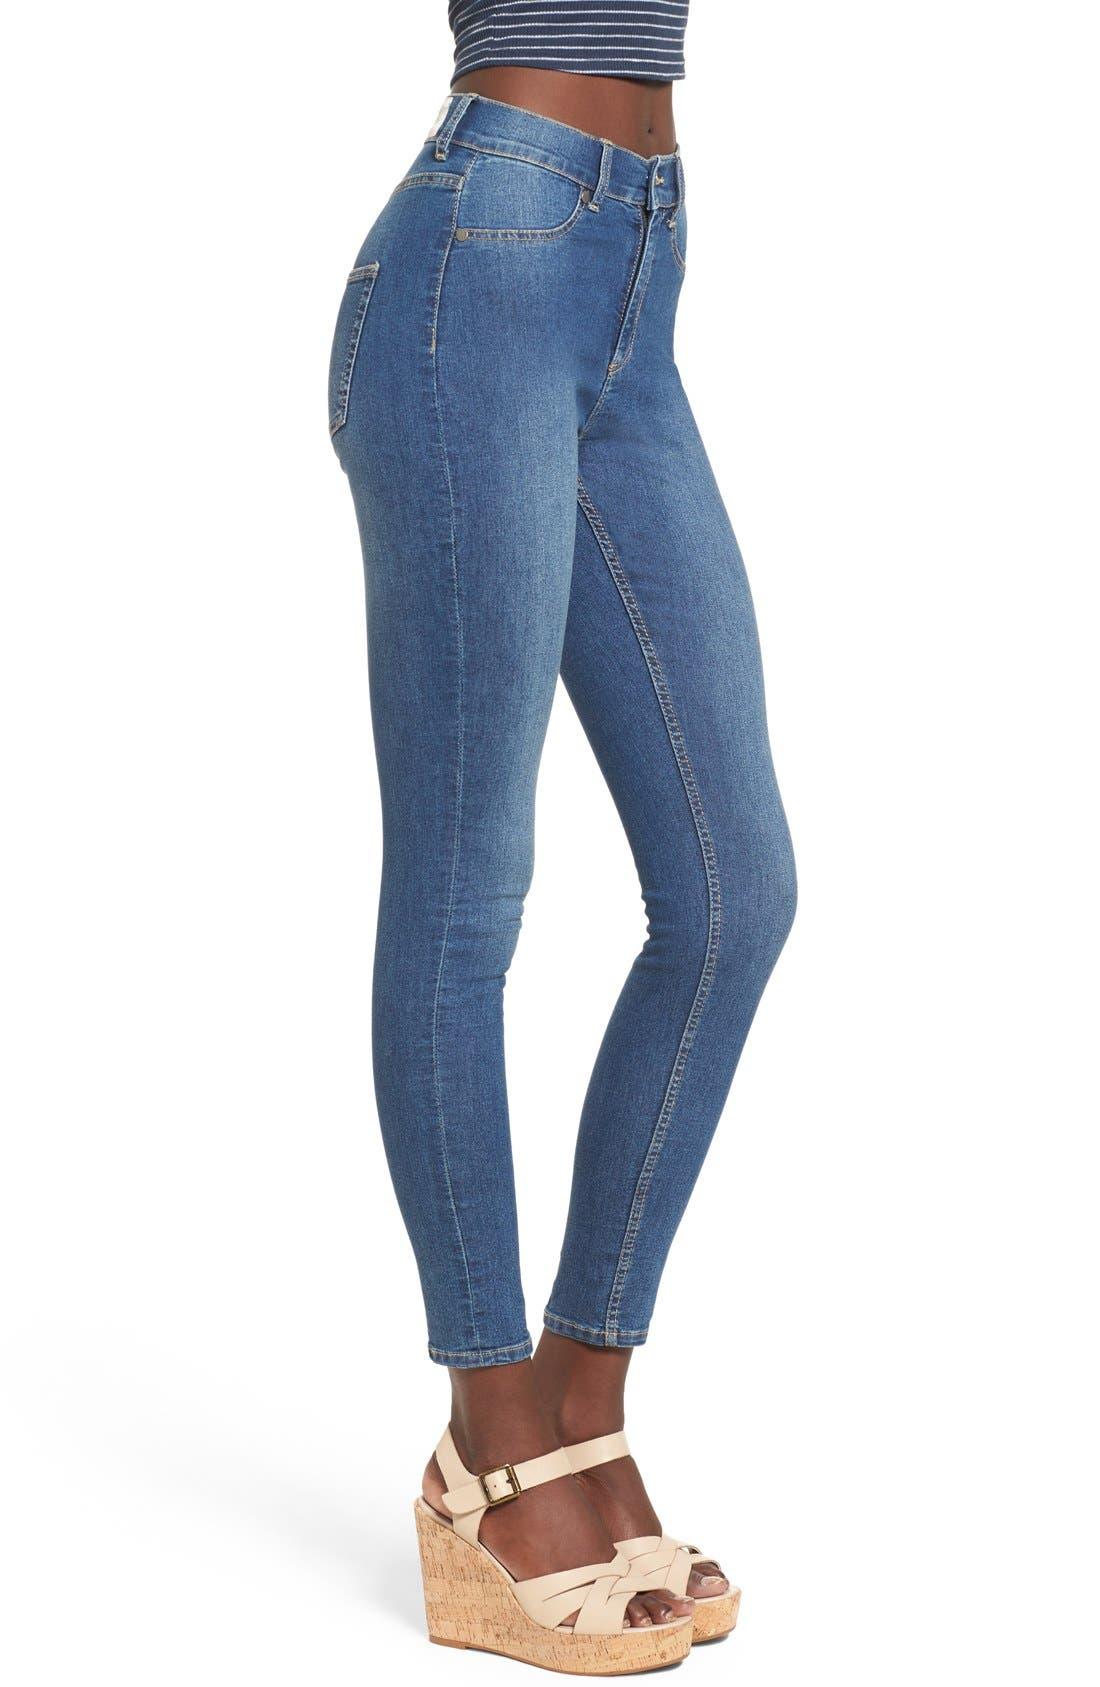 Alternate Image 3  - Cheap Monday 'High Spray' High Rise Skinny Jeans